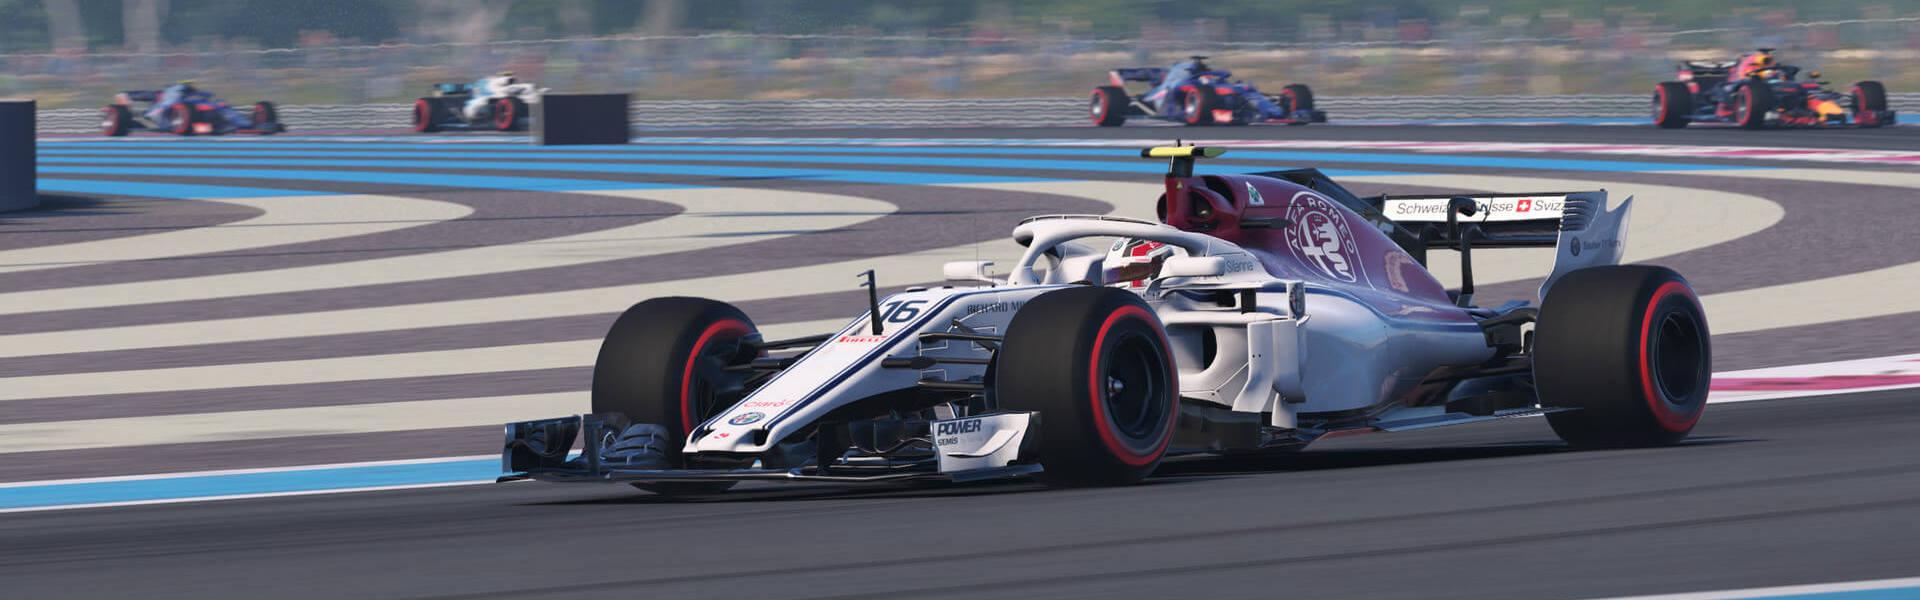 F1 2018 - Headline Content Pack (DLC) Steam Key EUROPE